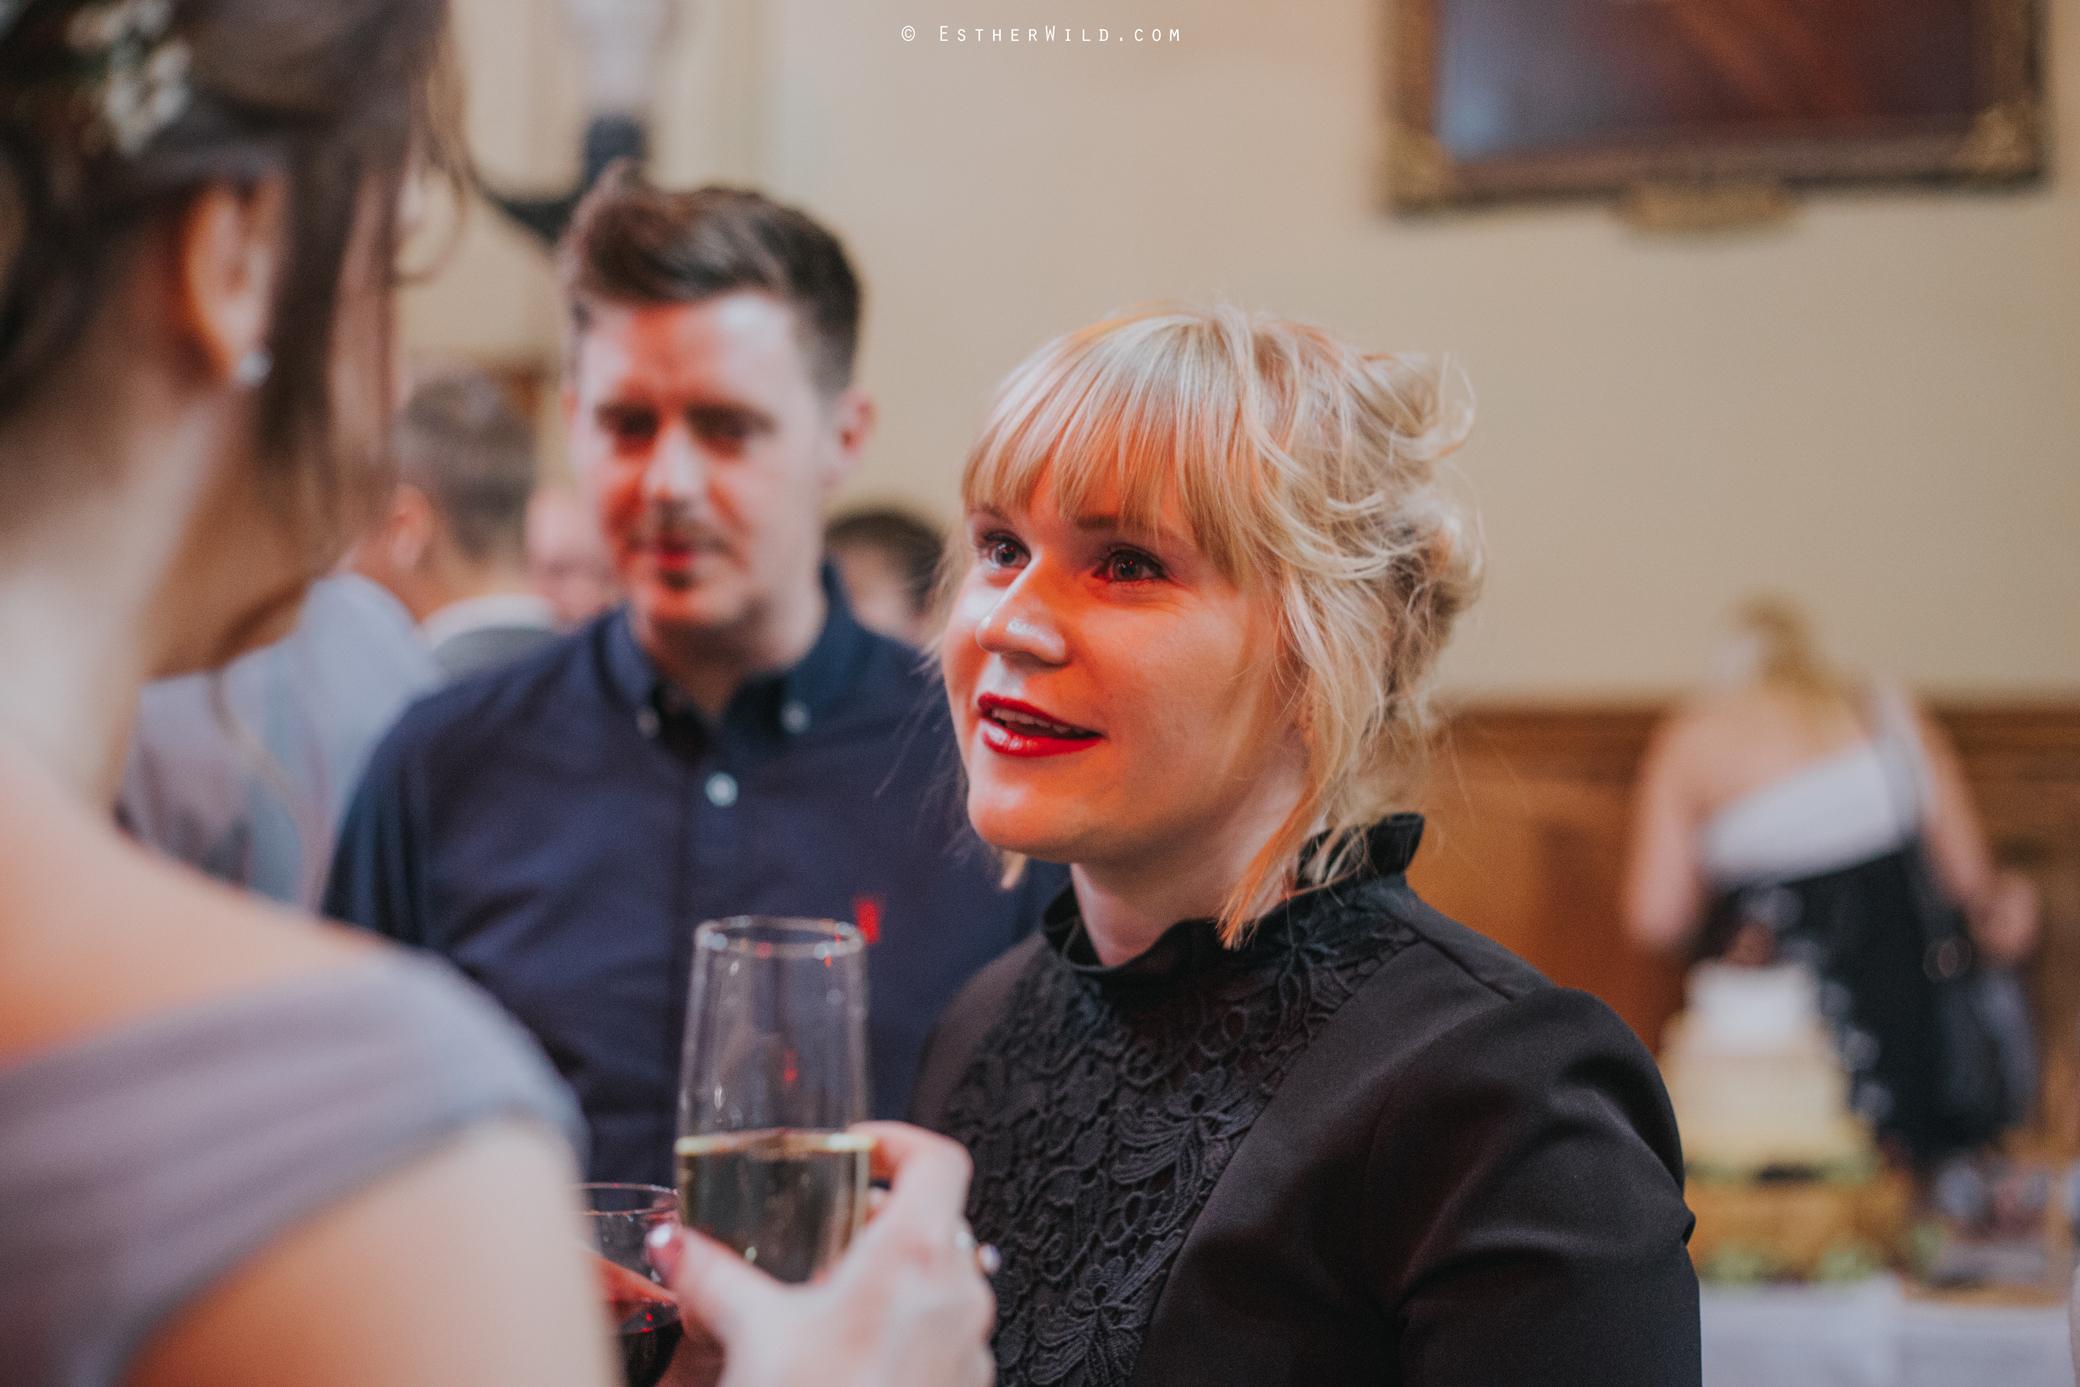 Wedding_Kings_Lynn_Town_Hall_Norfolk_Photographer_Esther_Wild_IMG_1787.jpg